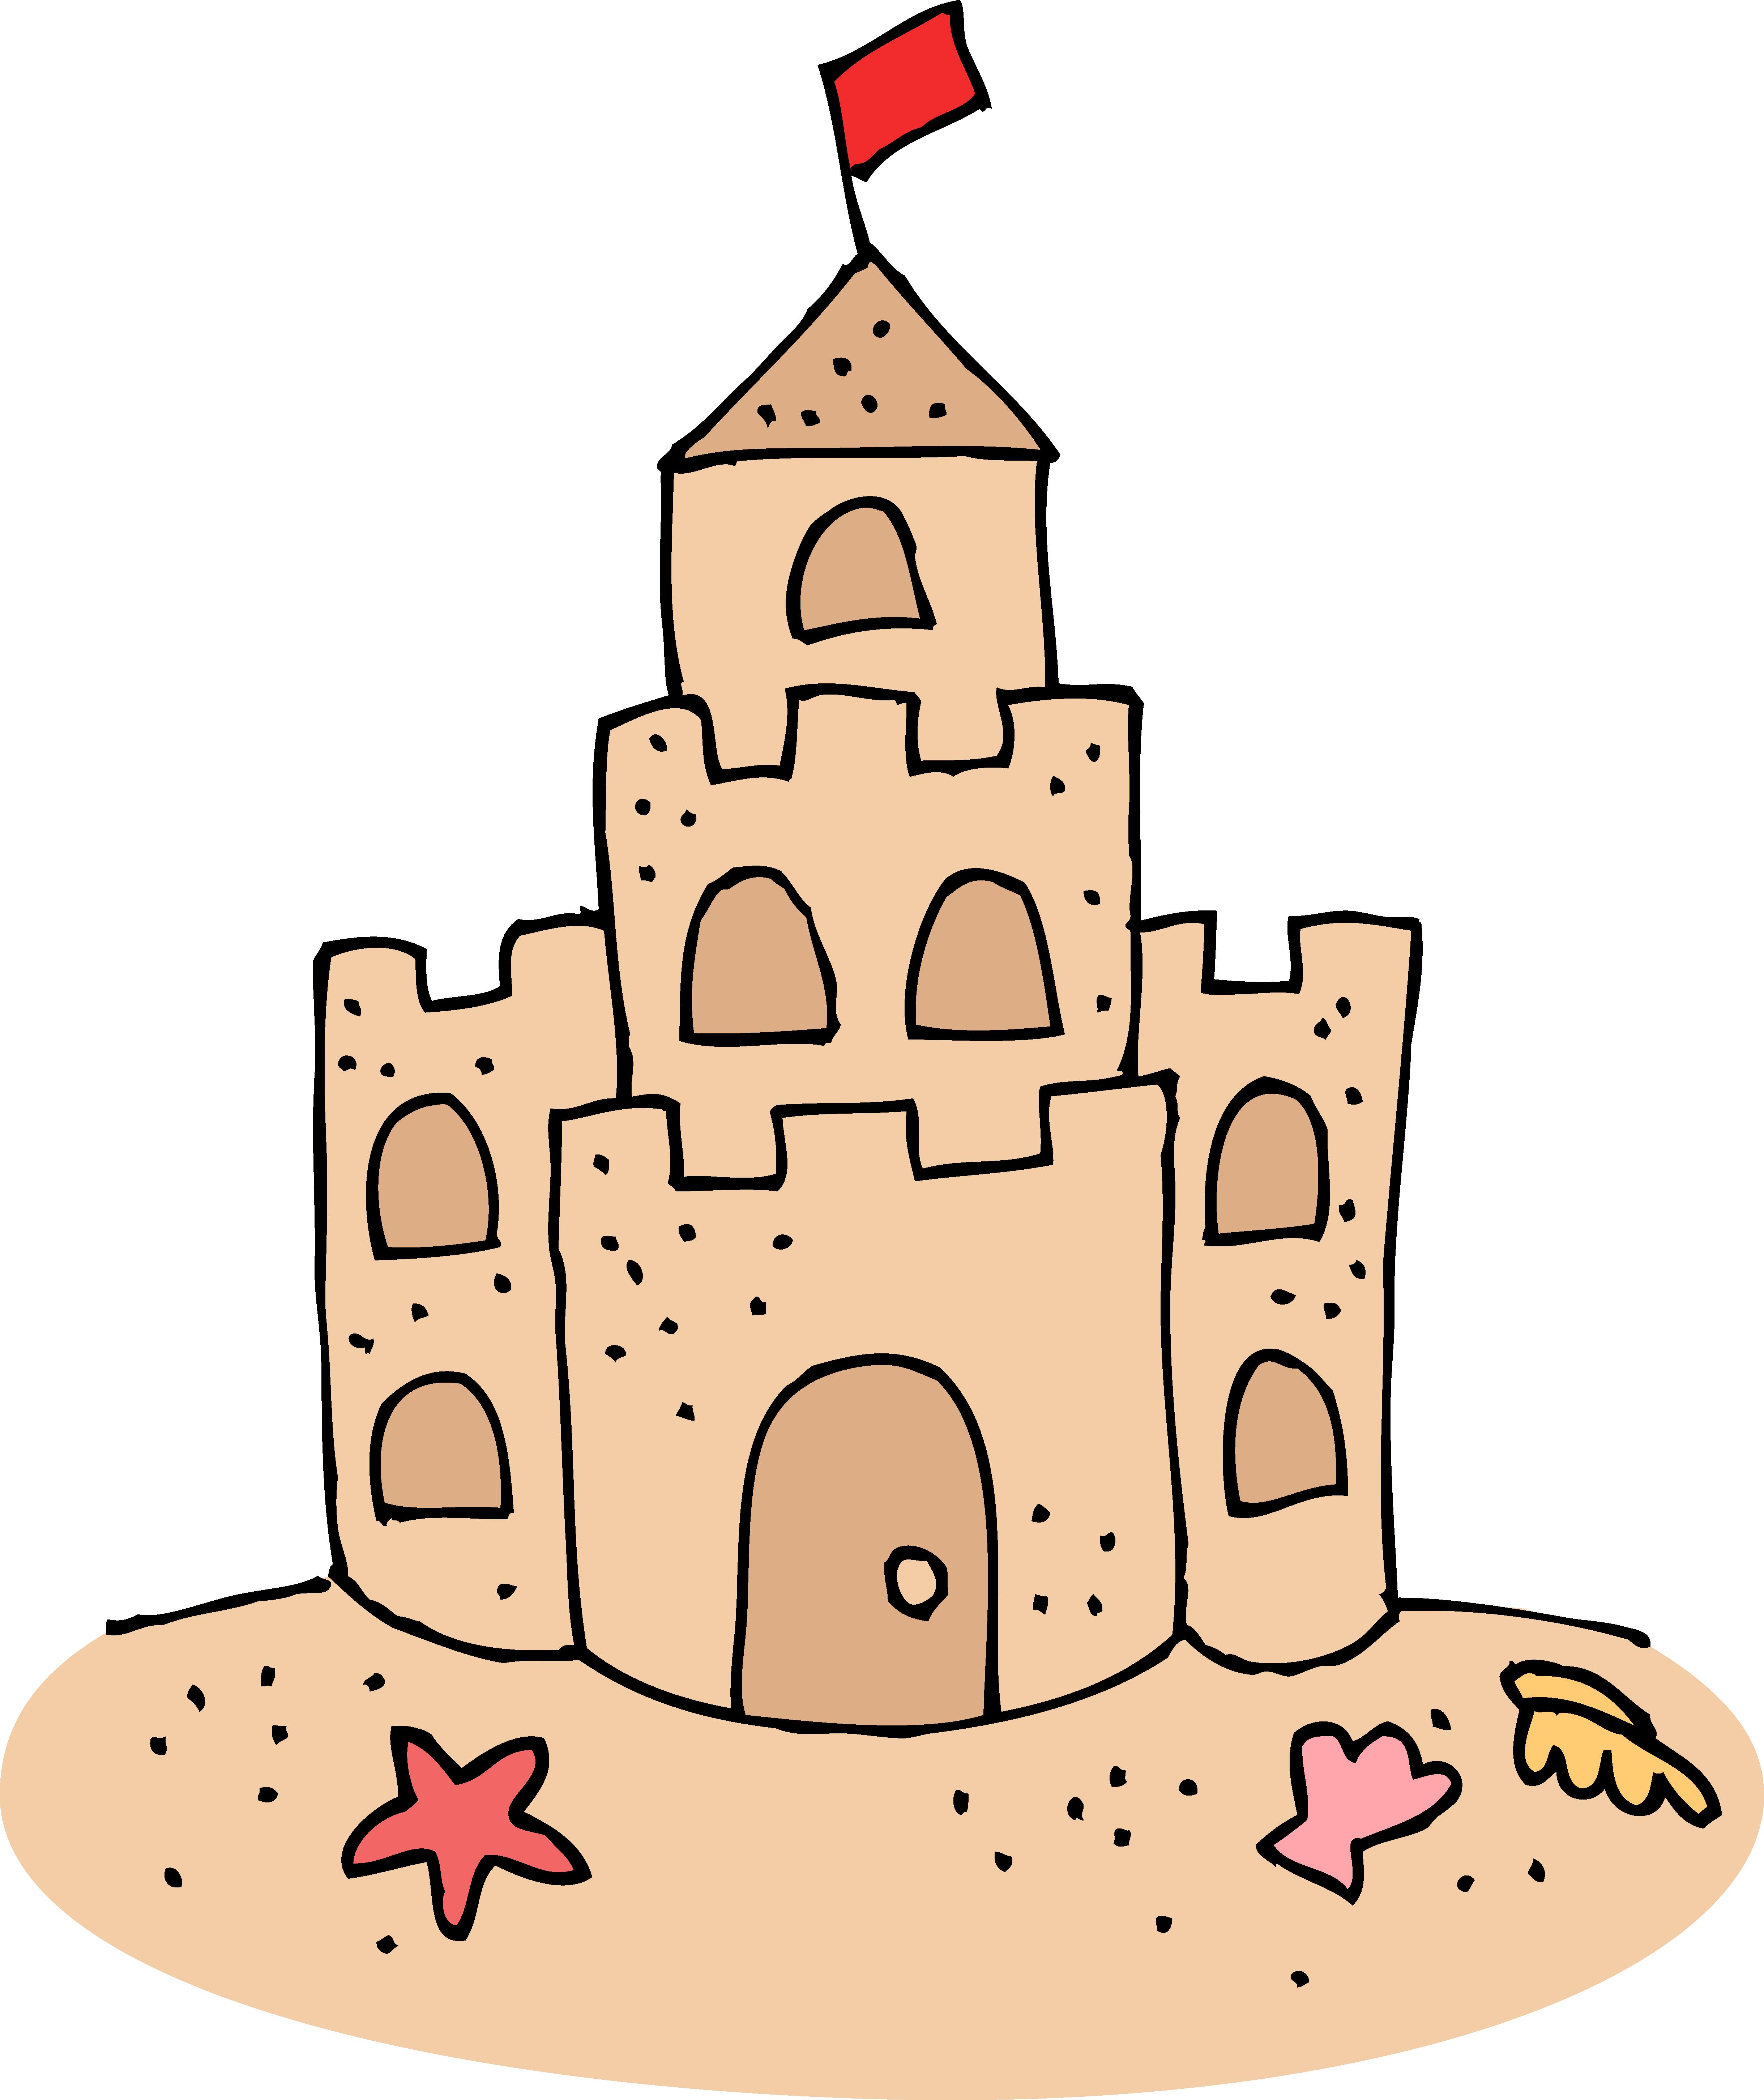 Sand castle silhouette photo